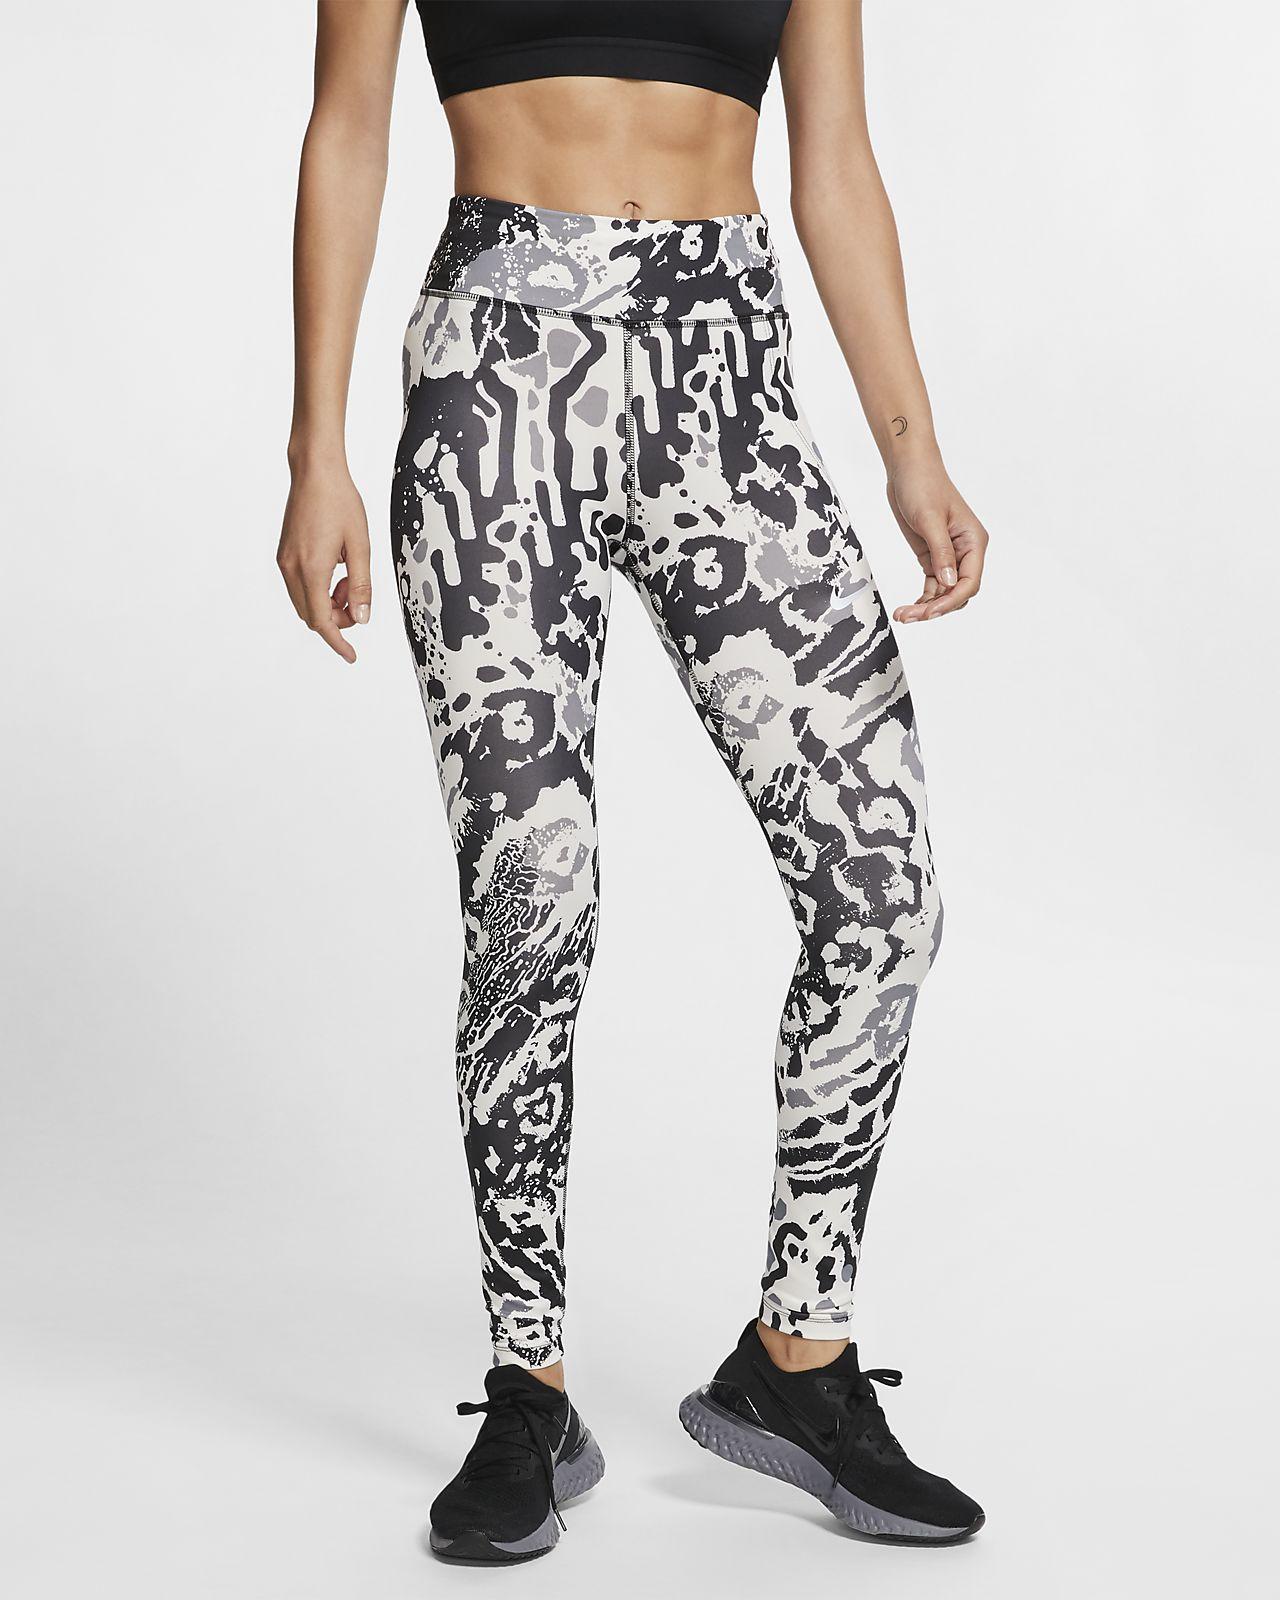 Nike Fast Women's 7/8 Printed Running Leggings